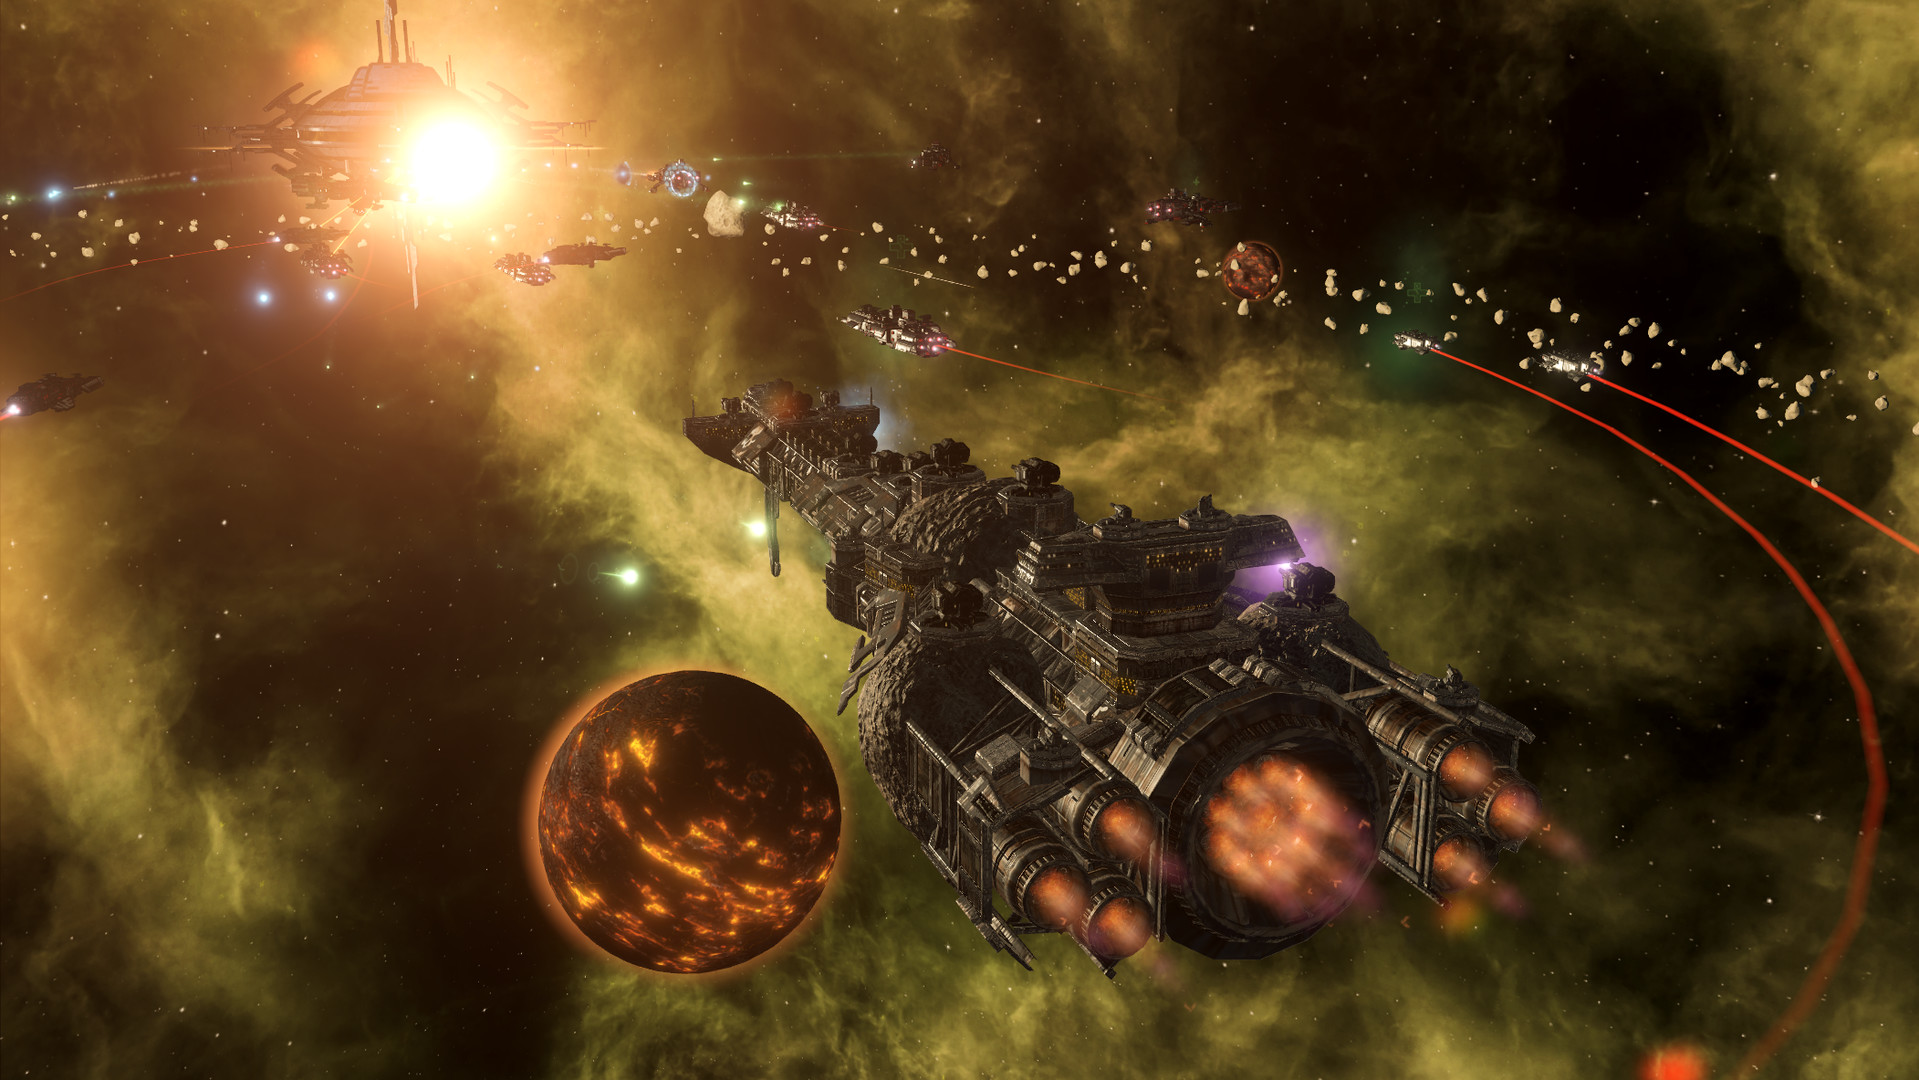 Stellaris Apocalypse for Mac 2.0 激活版 - 太空探险为核心的战略游戏